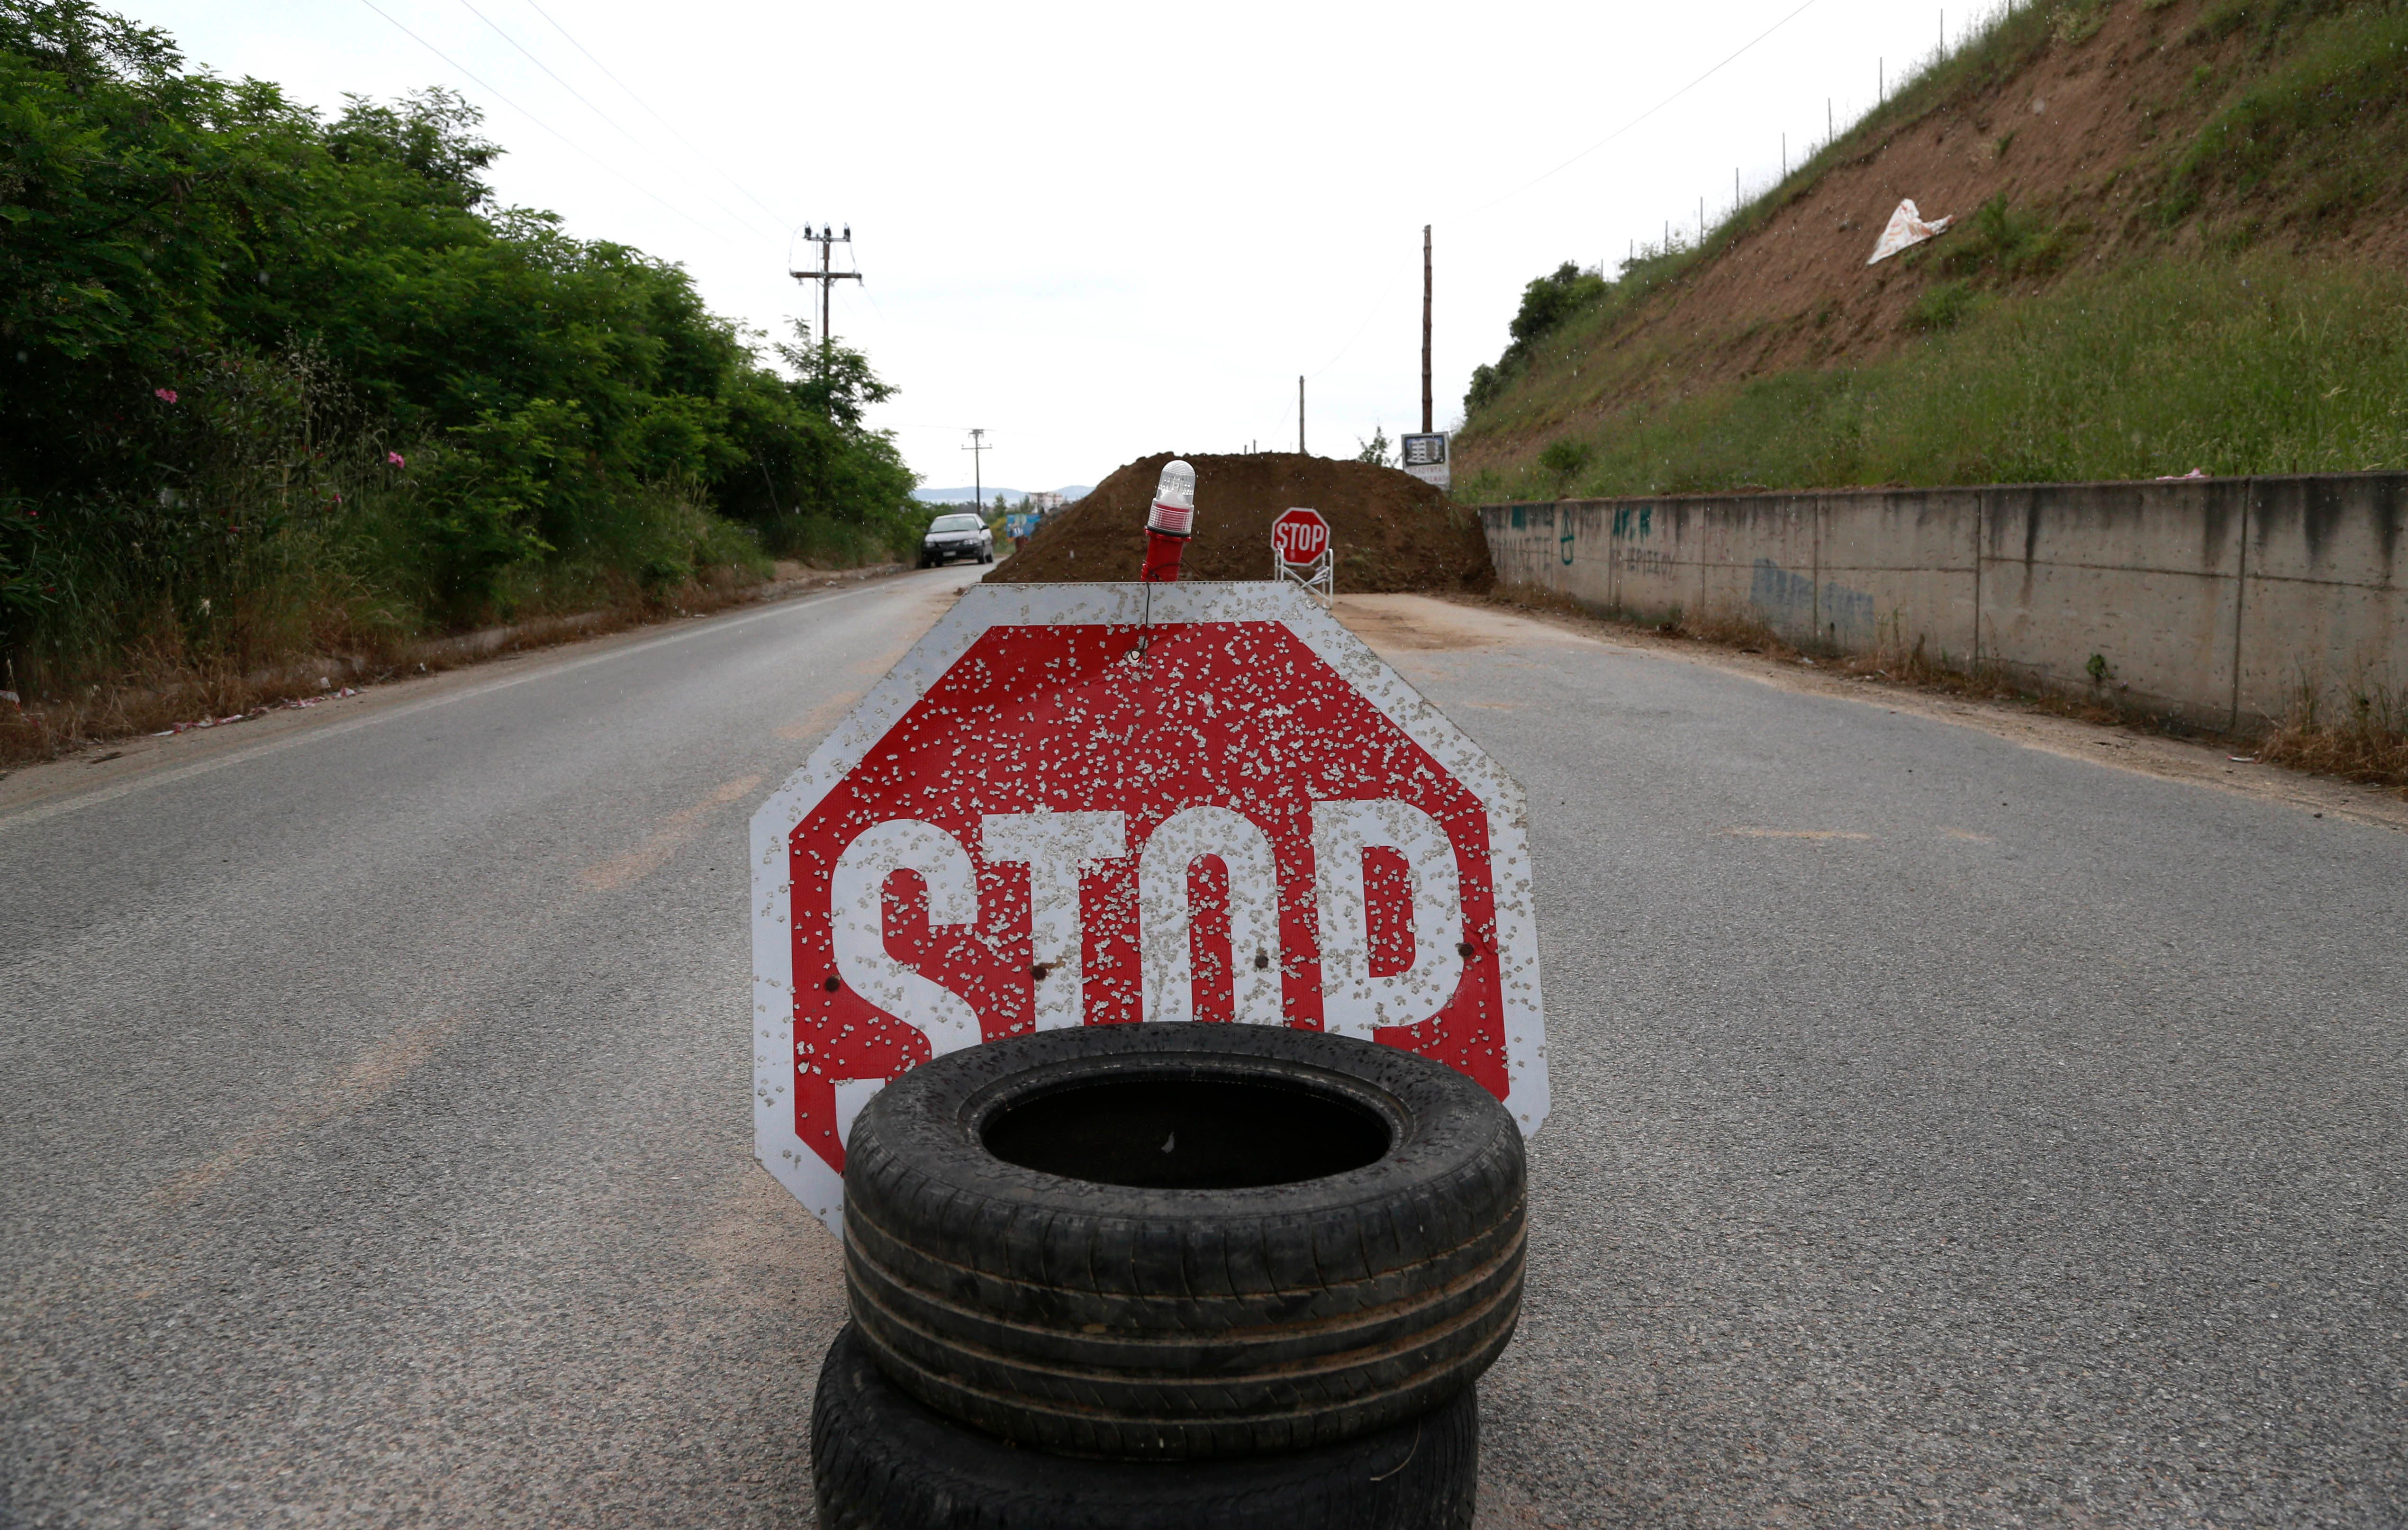 STOP: Χιλιάδες υποψήφιοι οδηγοί στην «ουρά» λόγω απεργίας των